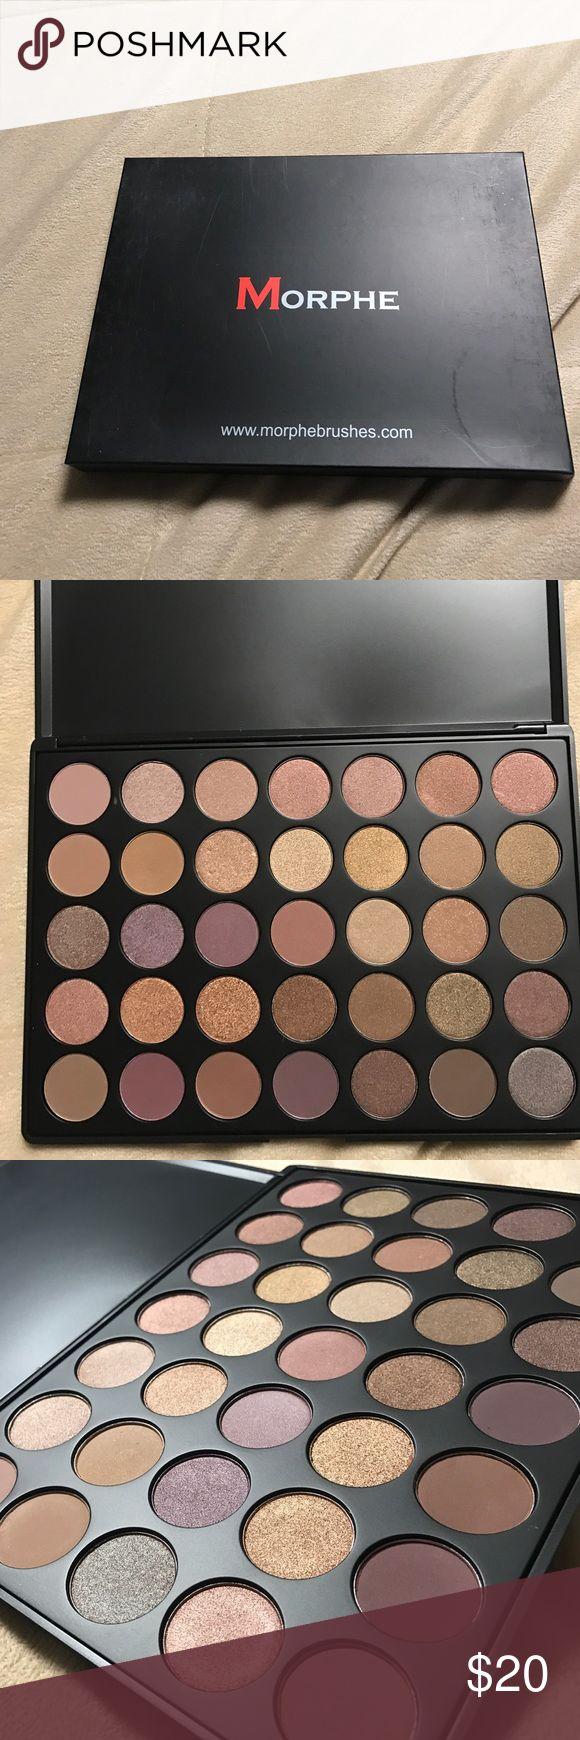 Morphe 35T eyeshadow pallet Brand New in box Morphe 35T eyeshadow pallet Morphe Makeup Eyeshadow